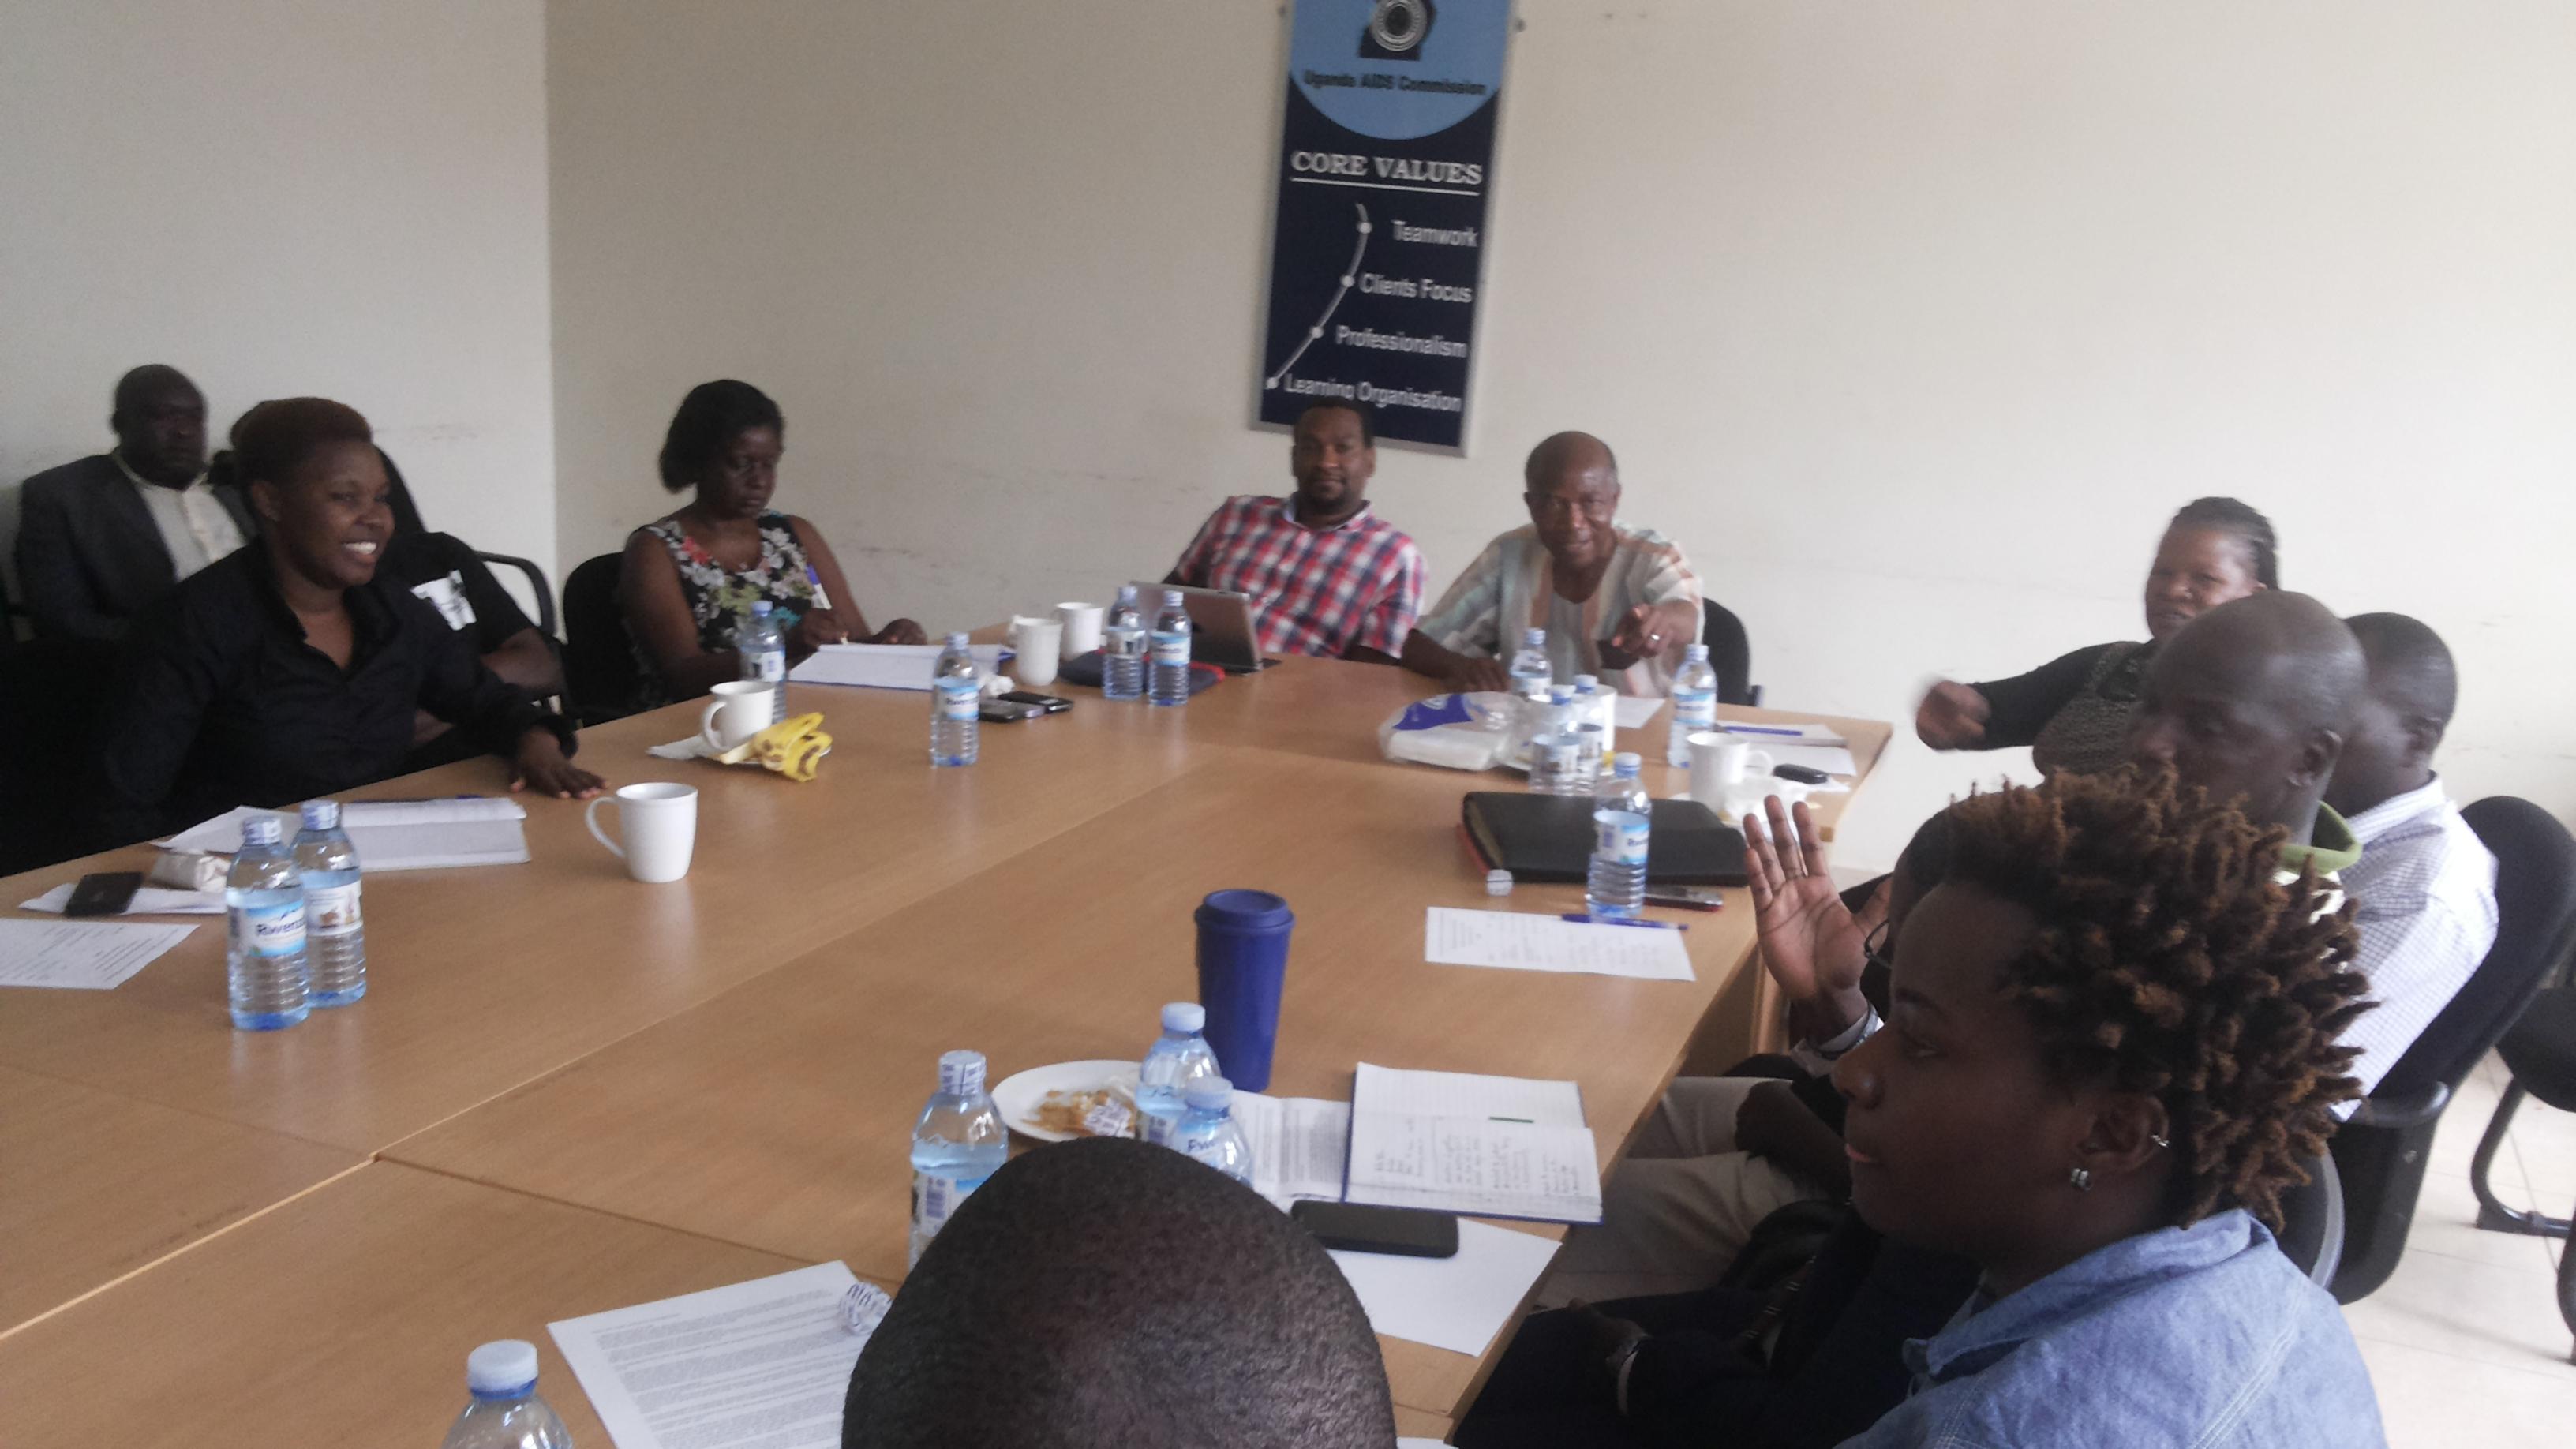 Uganda Country Coordinating Mechanism Uganda meeting, January 2014.